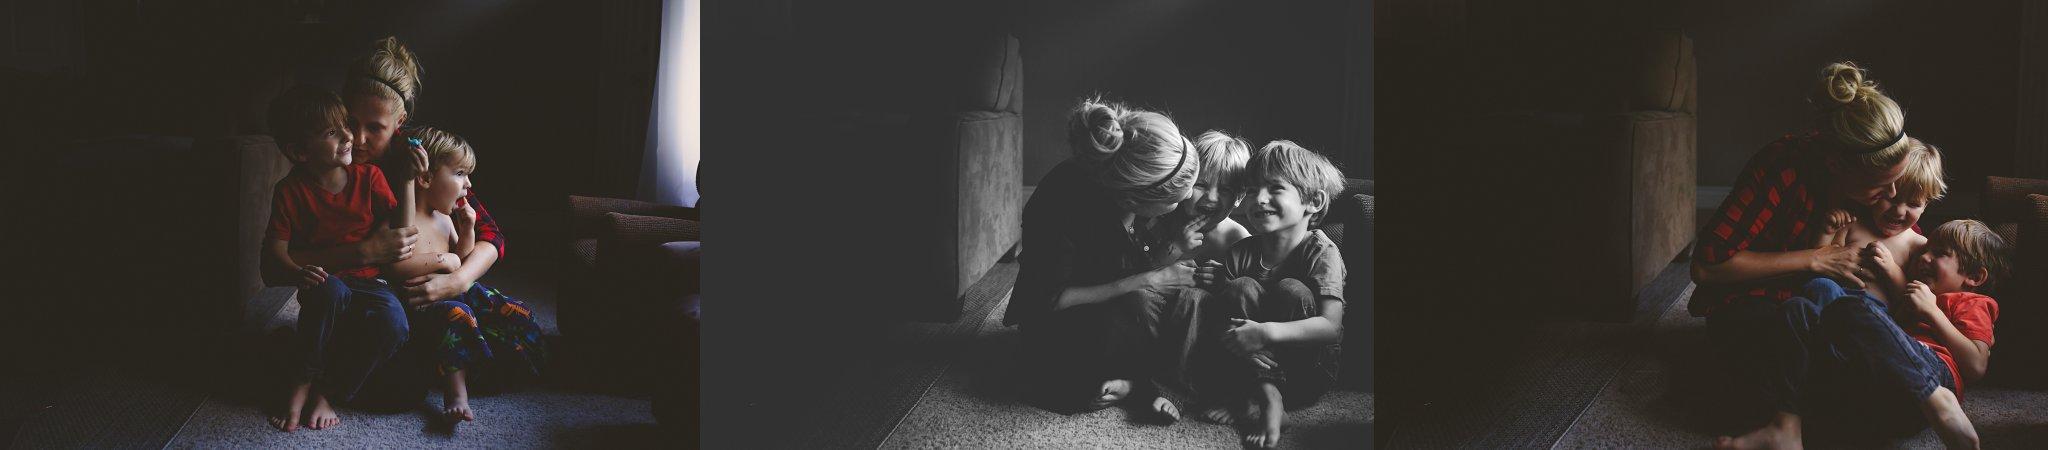 Becci Ravera Photography | Northern CA Lifestyle Photographer